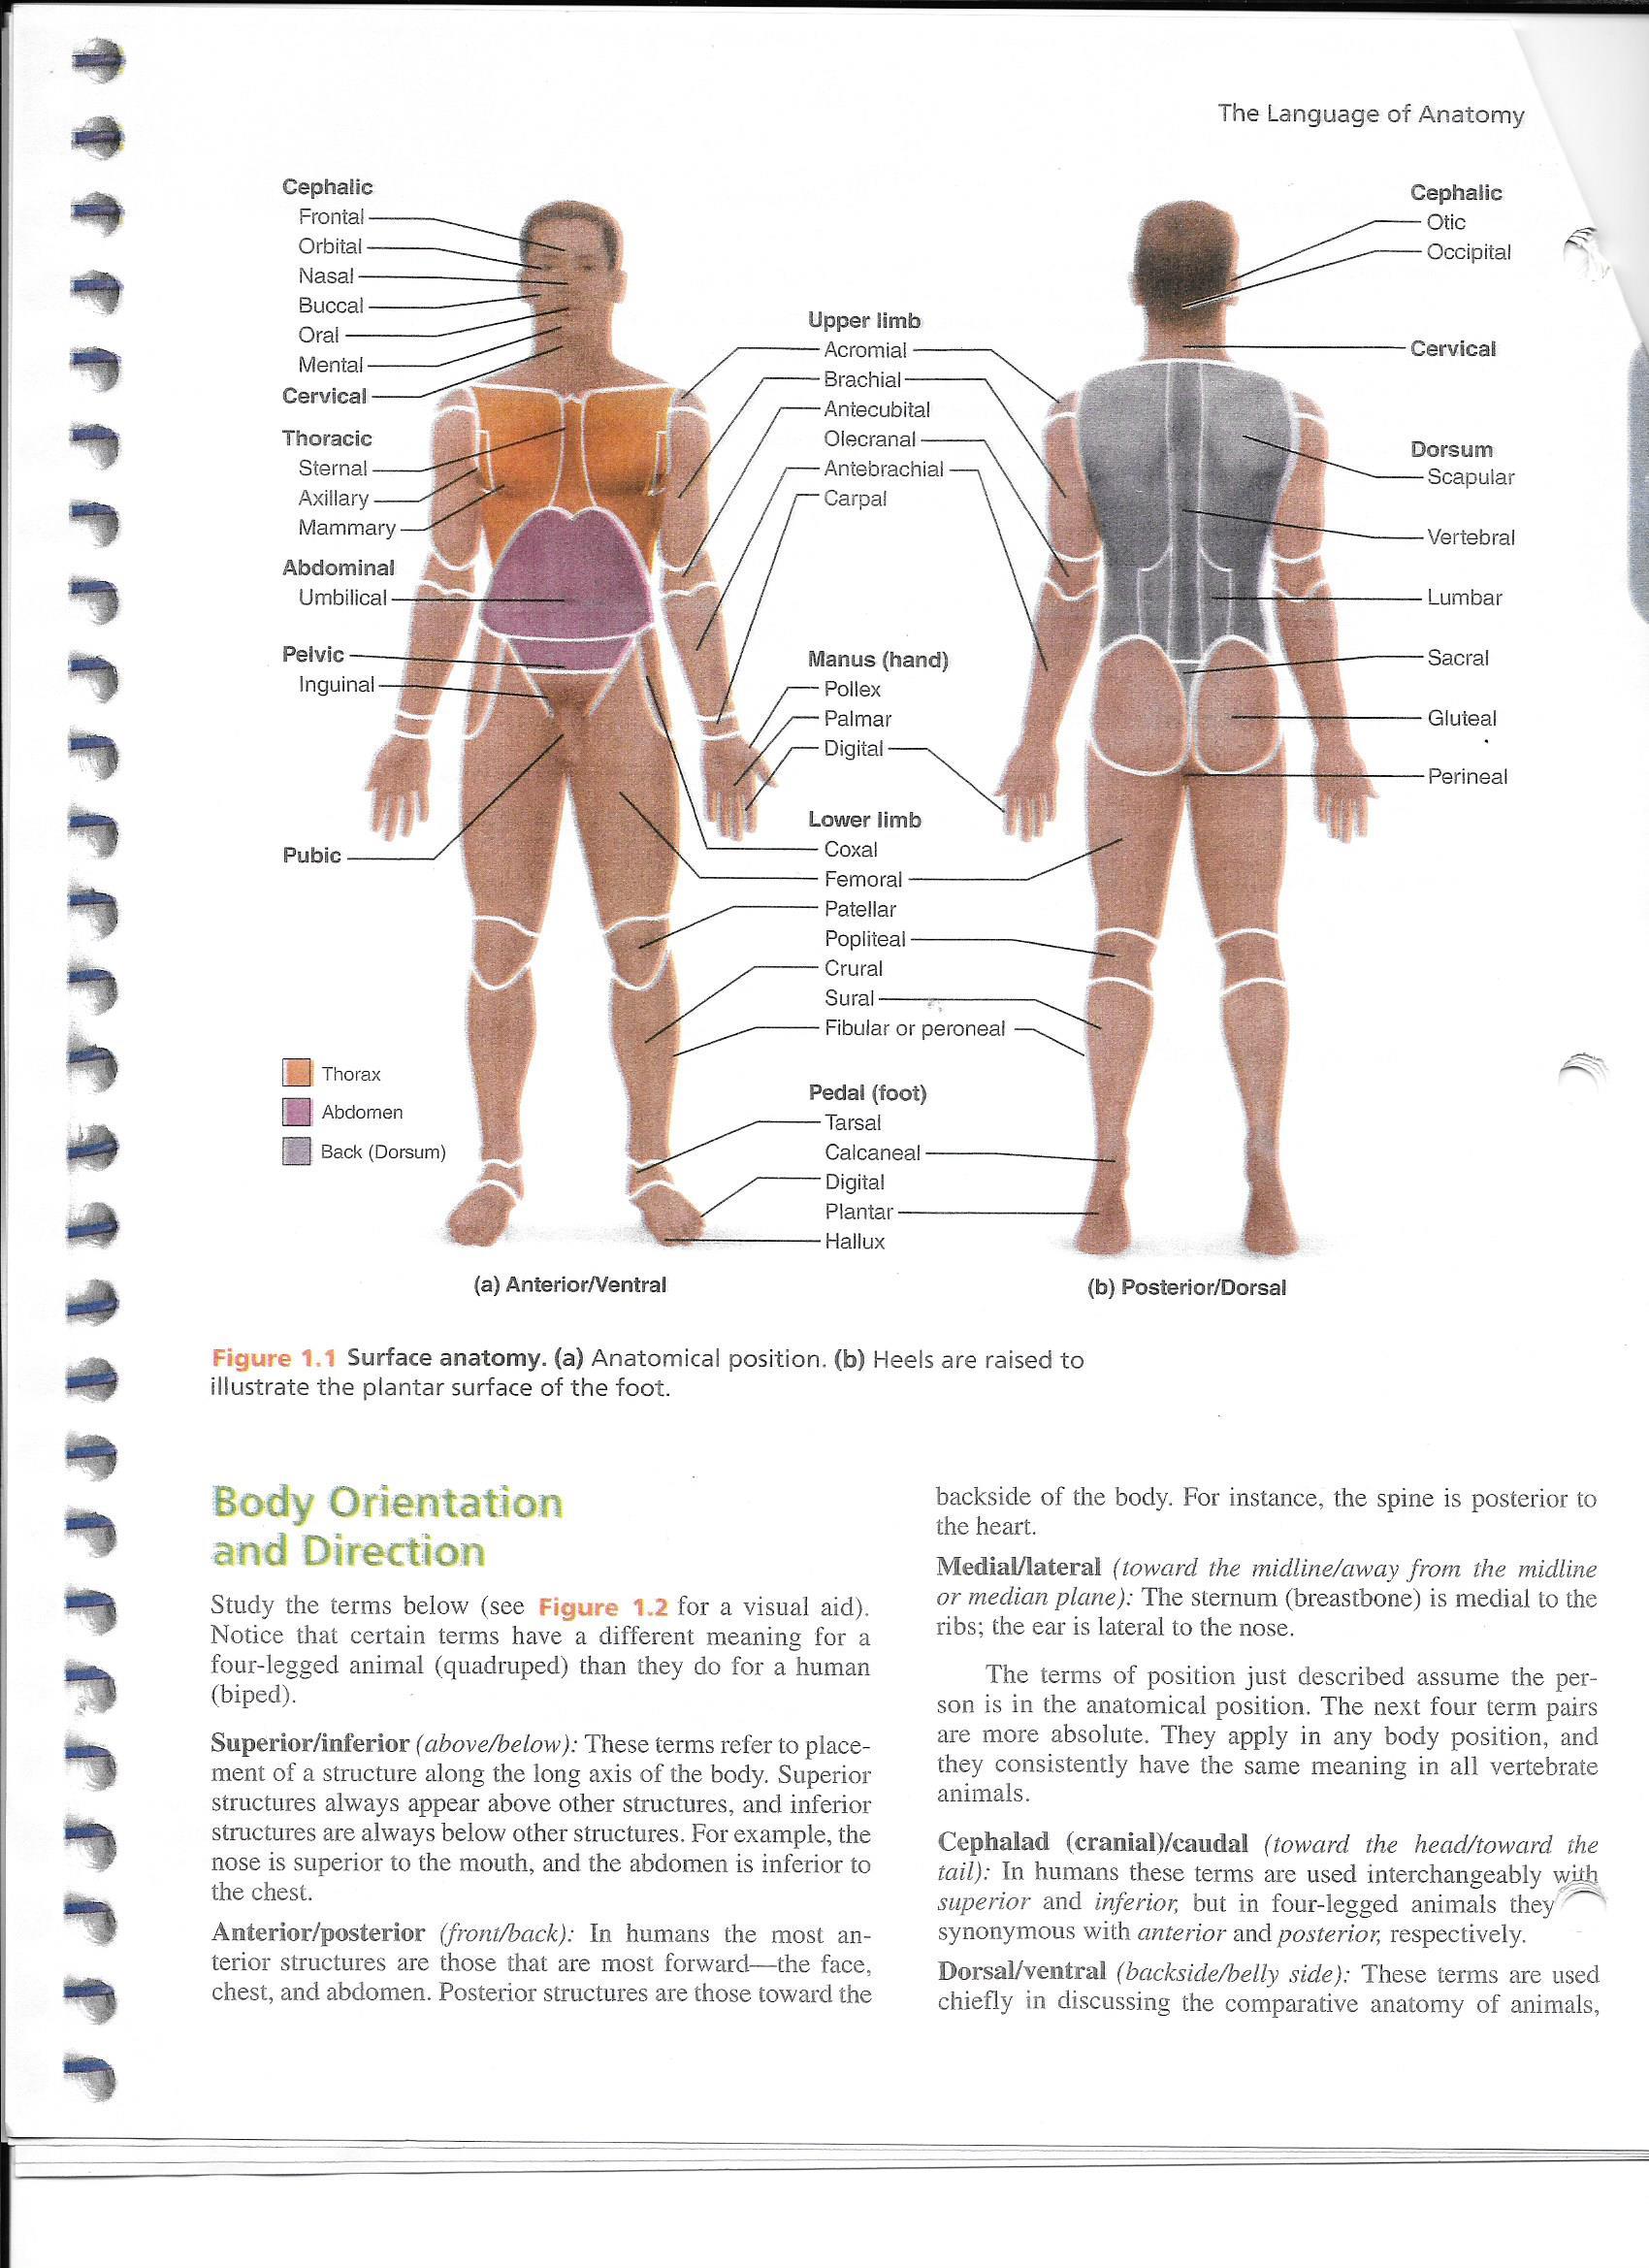 ImageQuiz: Surface Anatomy